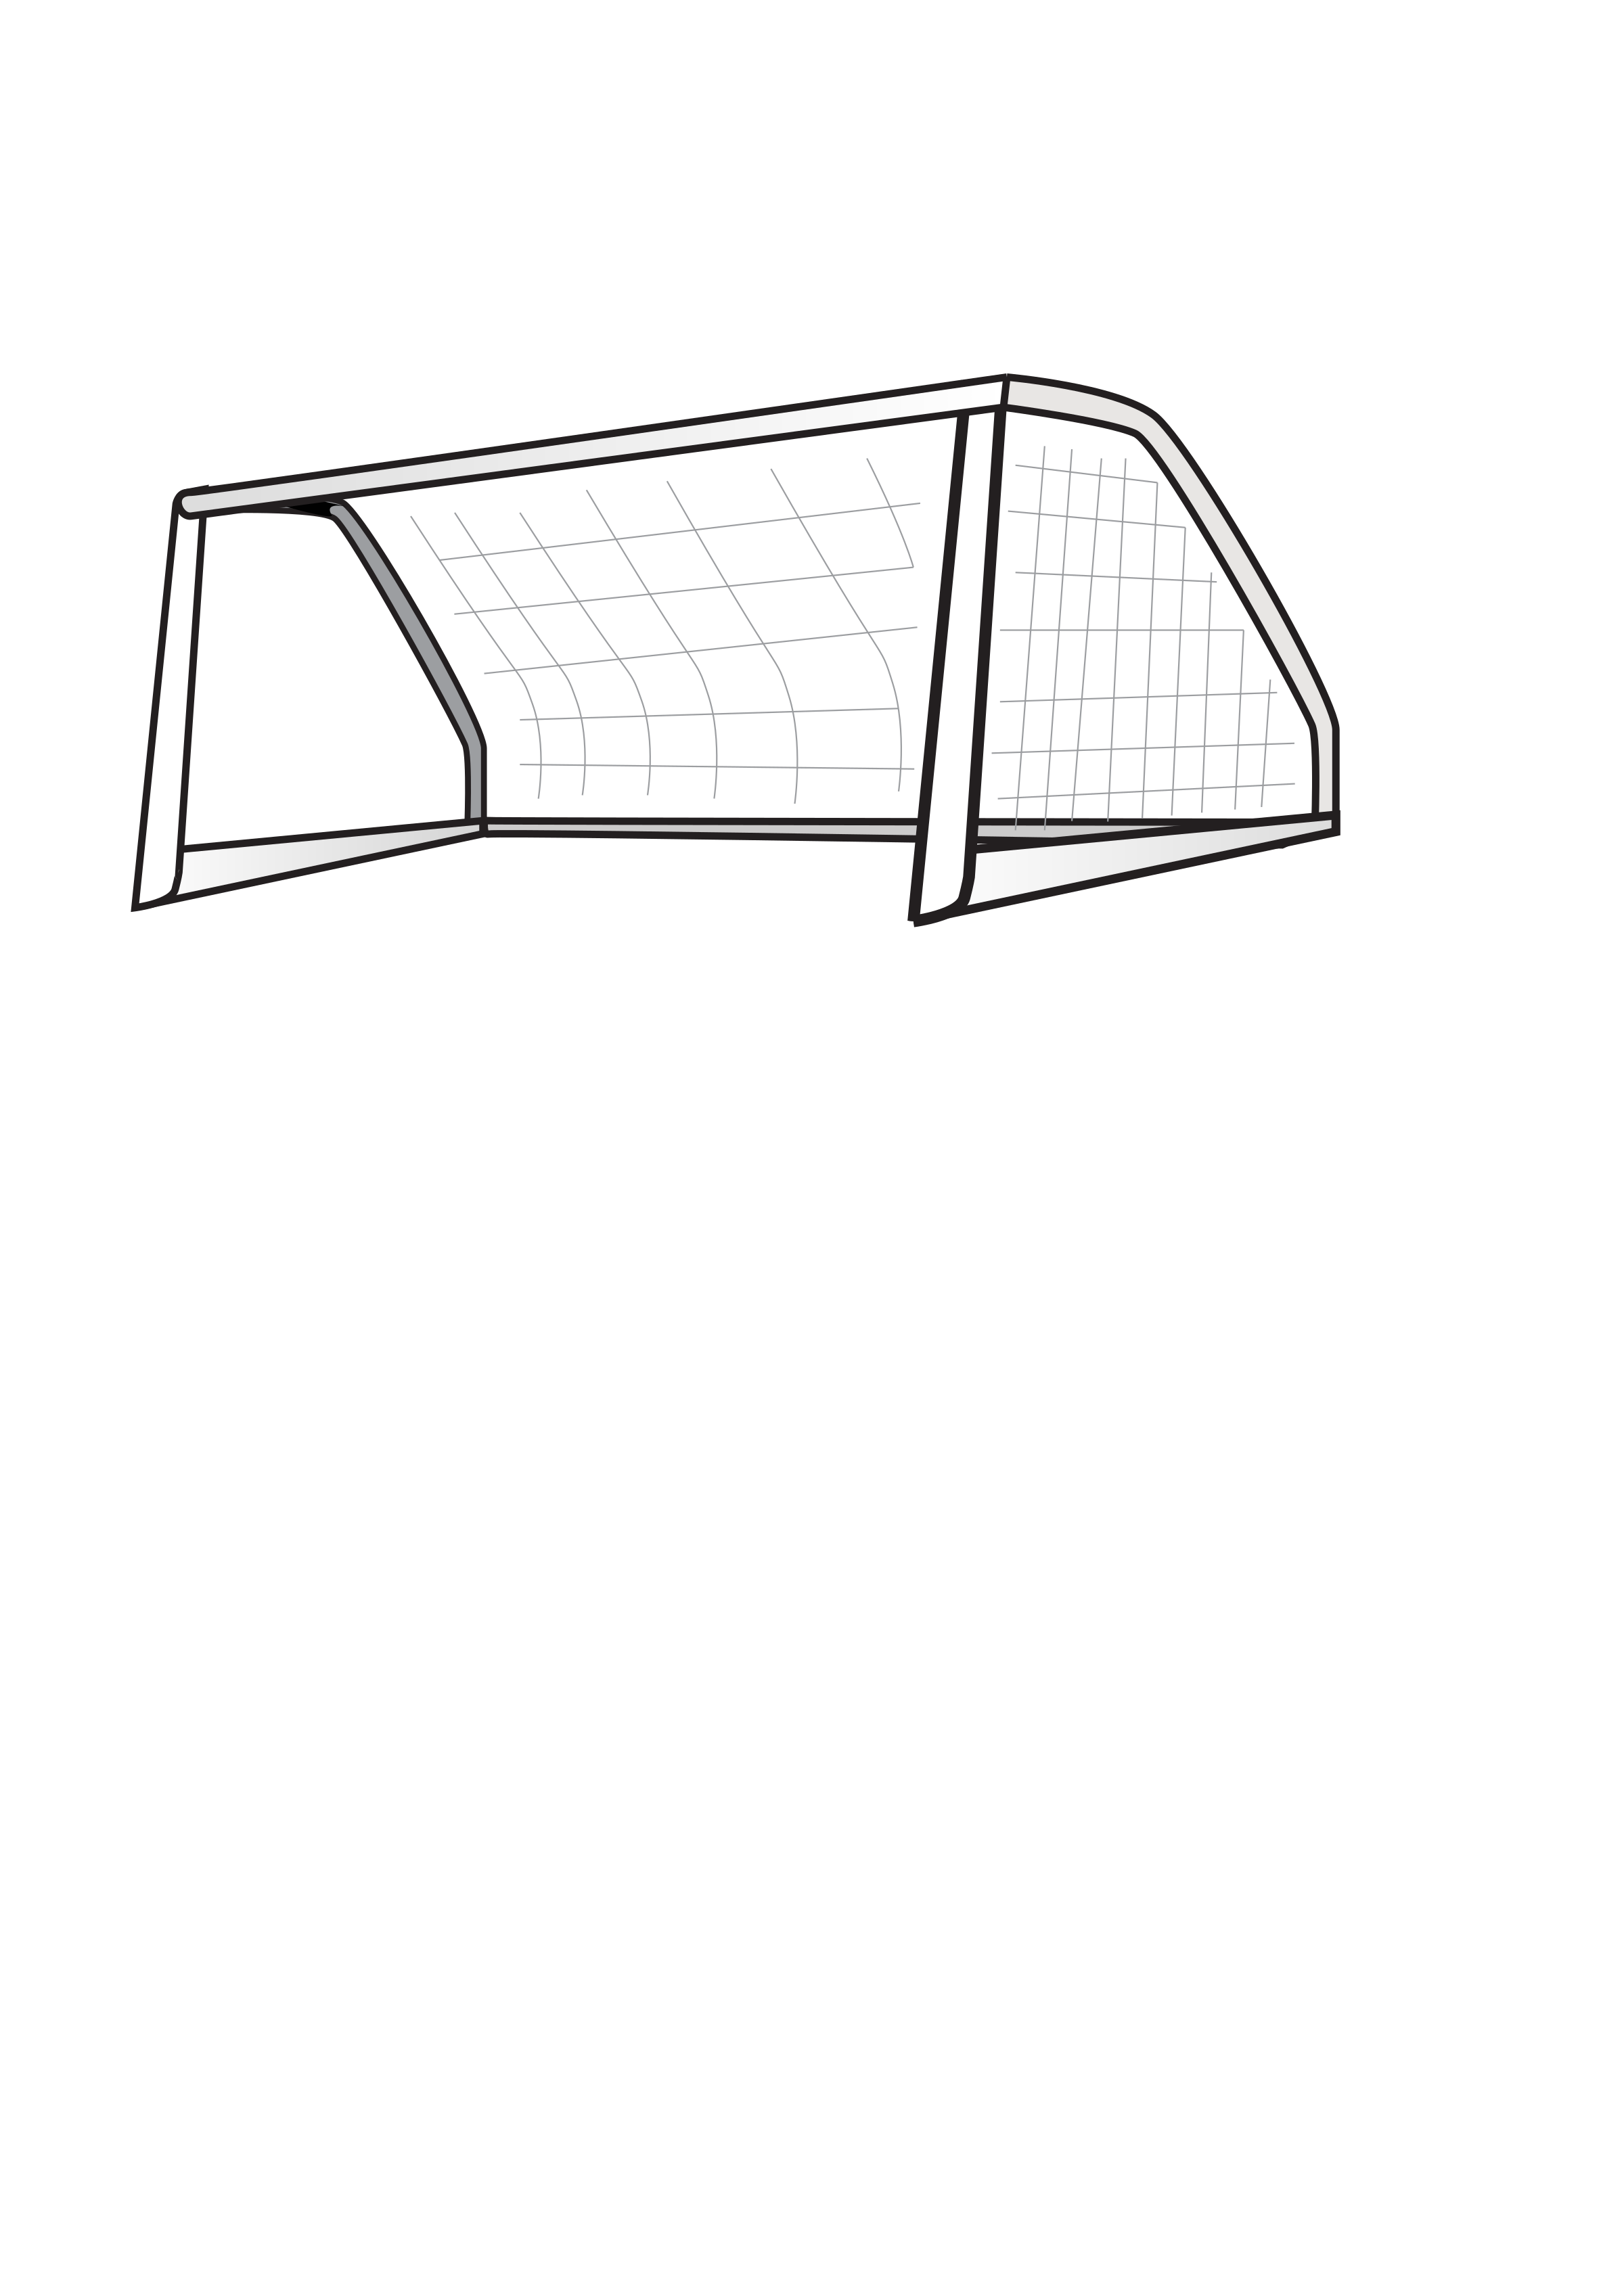 Football goals clipart jpg freeuse download Clipart - Soccer Goal jpg freeuse download